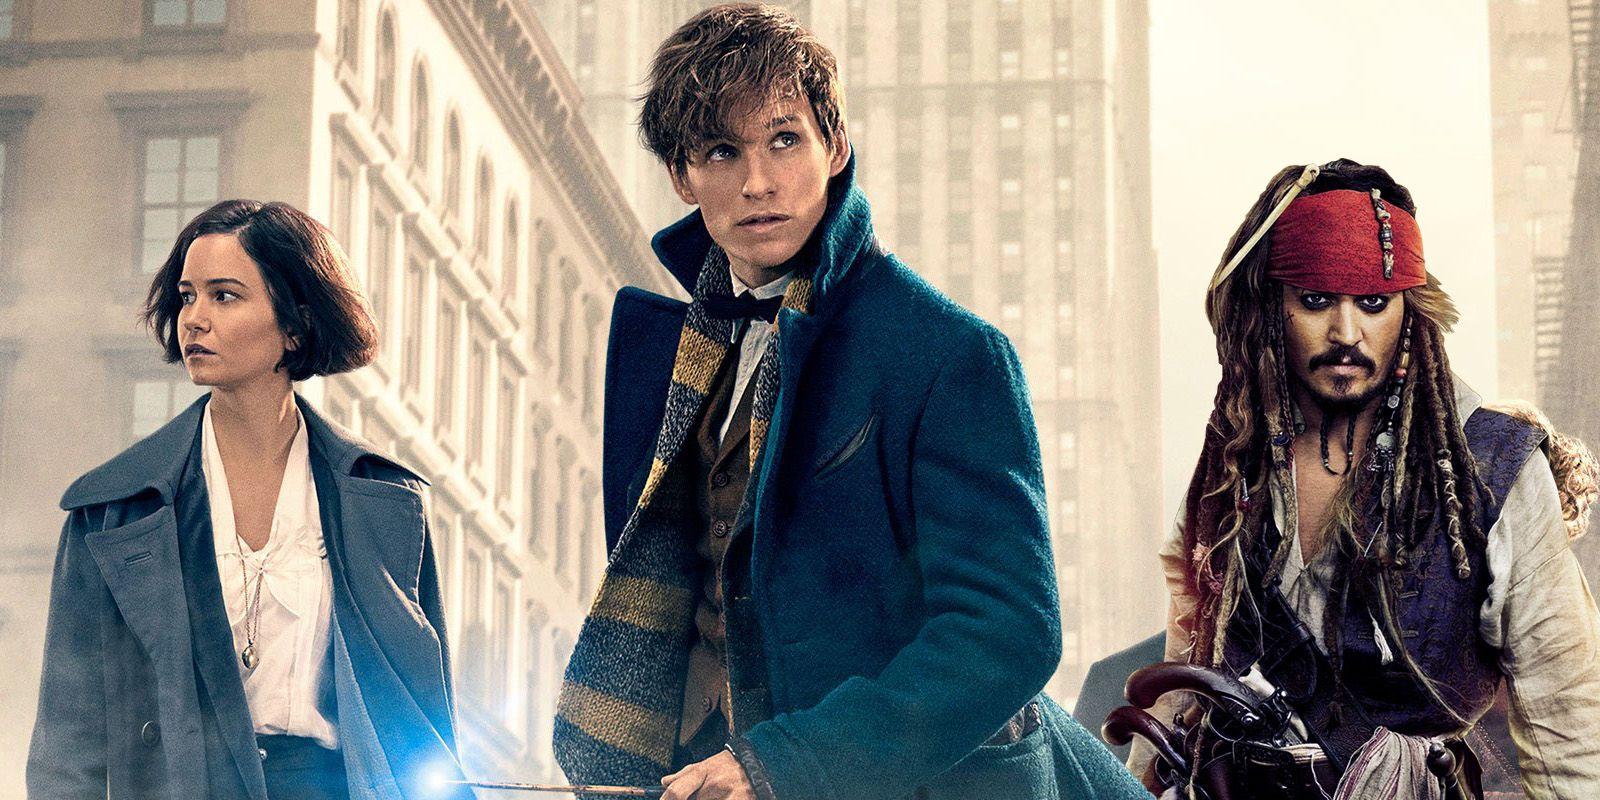 Fantastic Beasts Director Confirms Johnny Depps Character